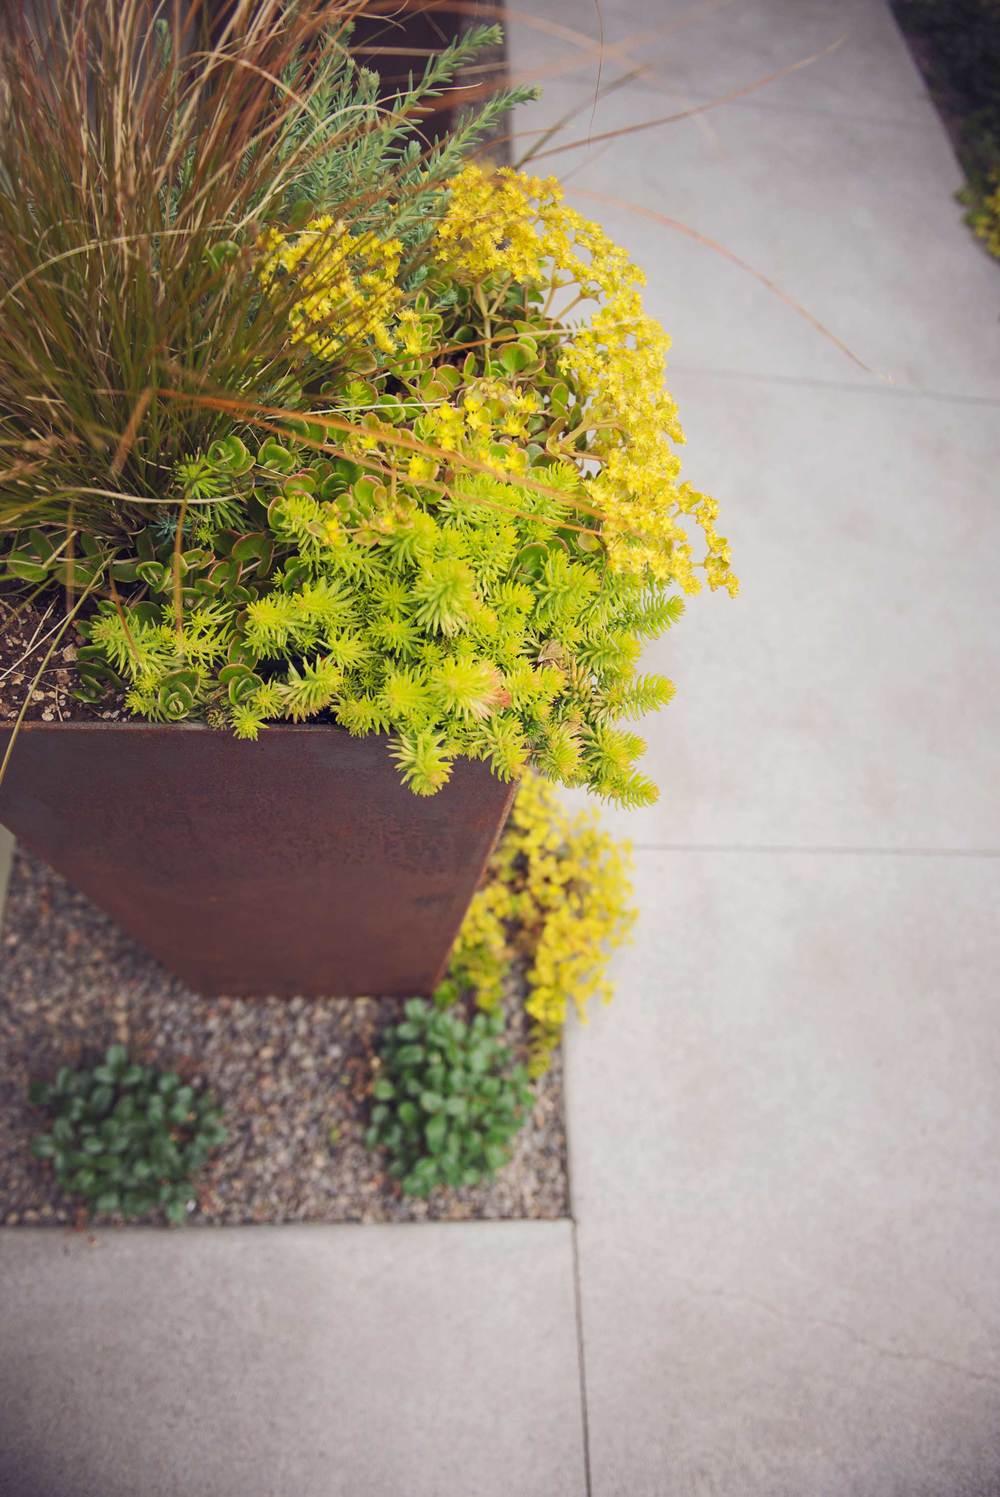 COR-TEN Steel Planter Design with Drought-Tolerant Succulents and Bronze Sedge in Medford.jpg